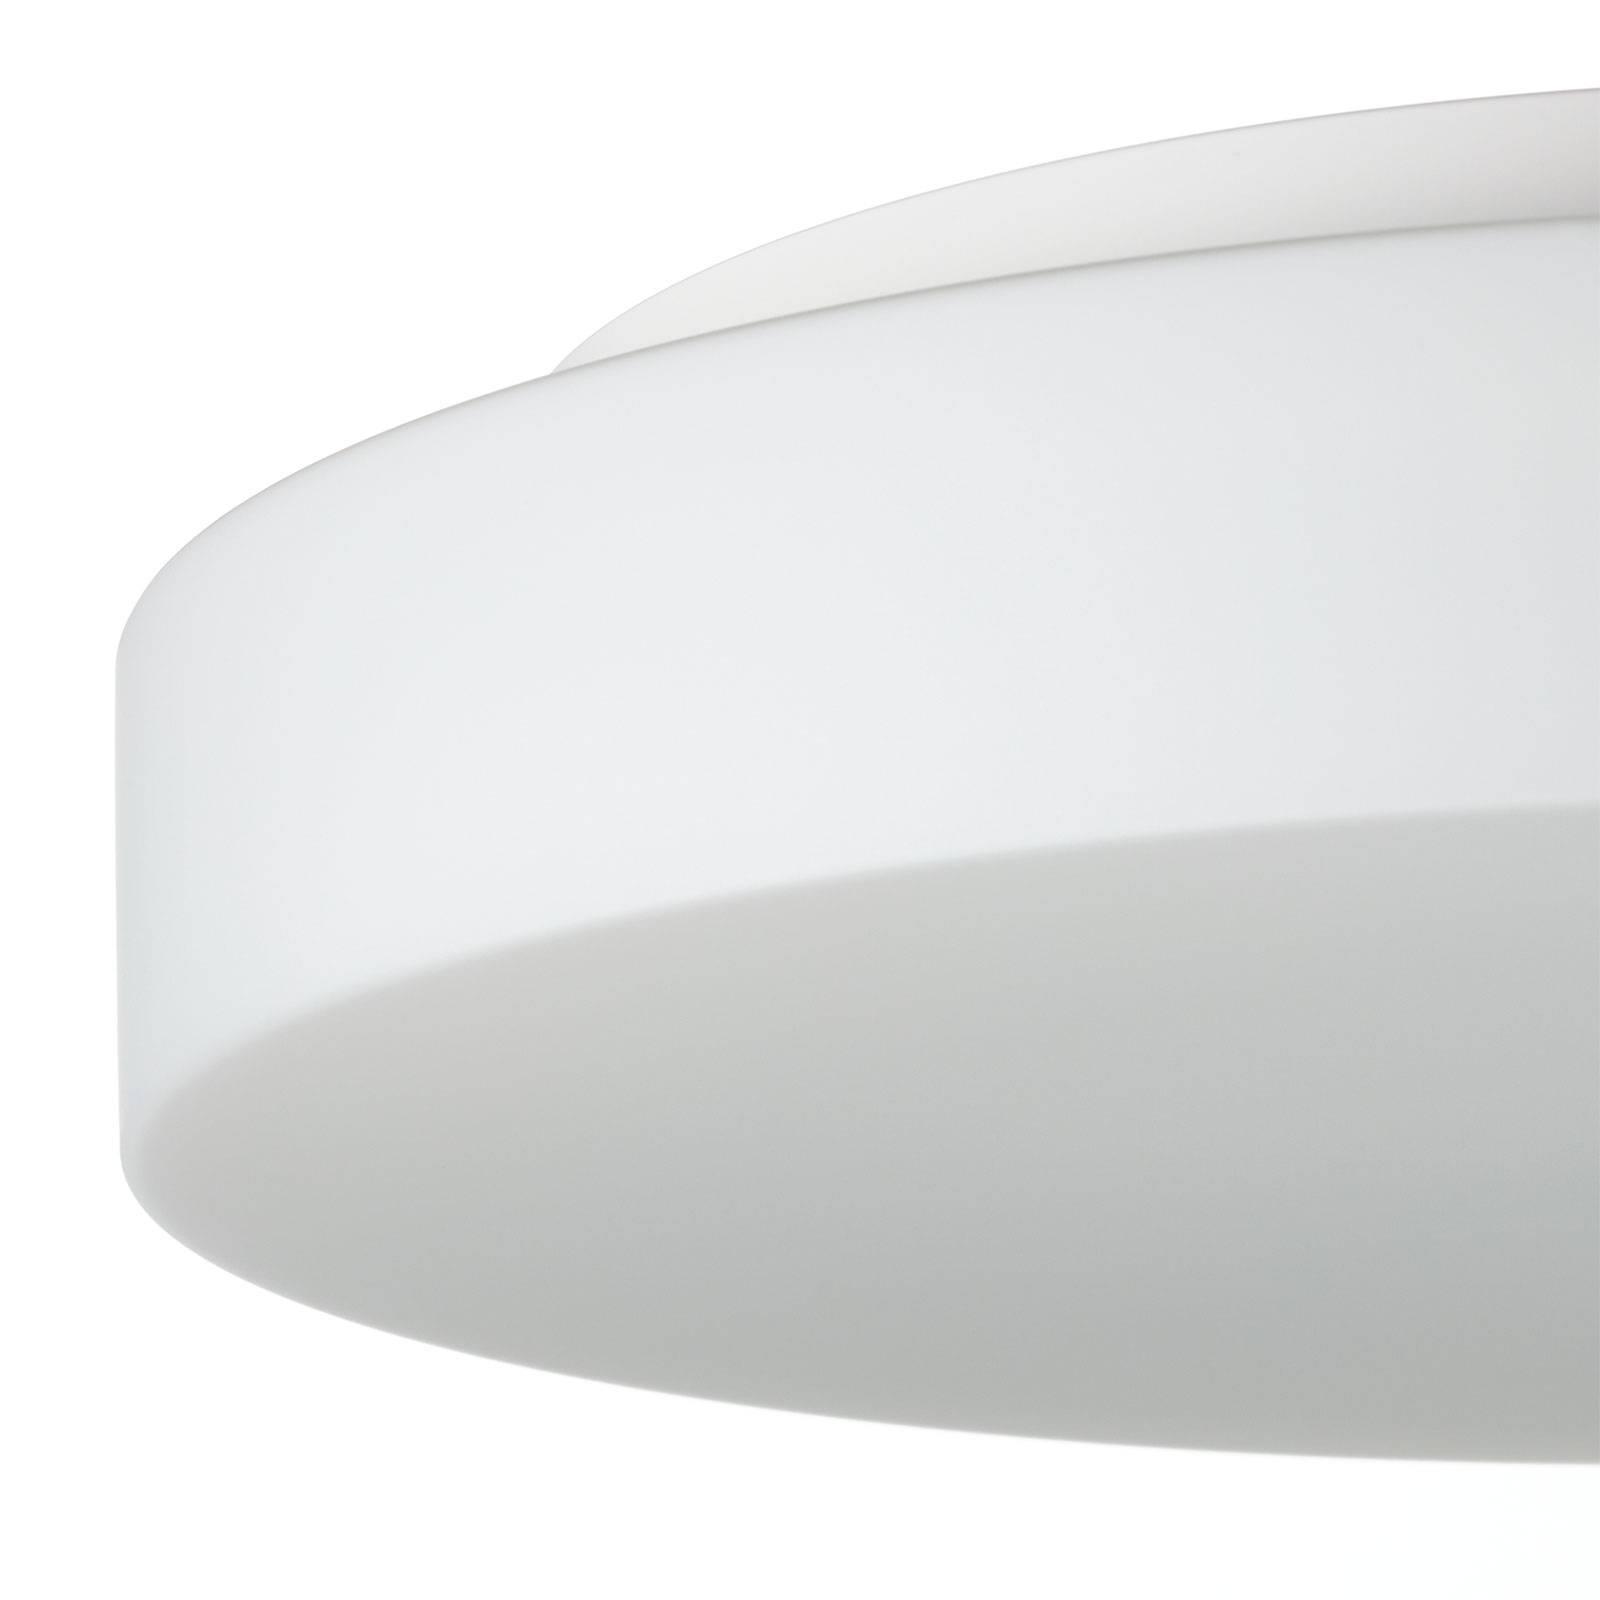 BEGA 23297 lampa sufitowa LED DALI 4000K Ø 47cm